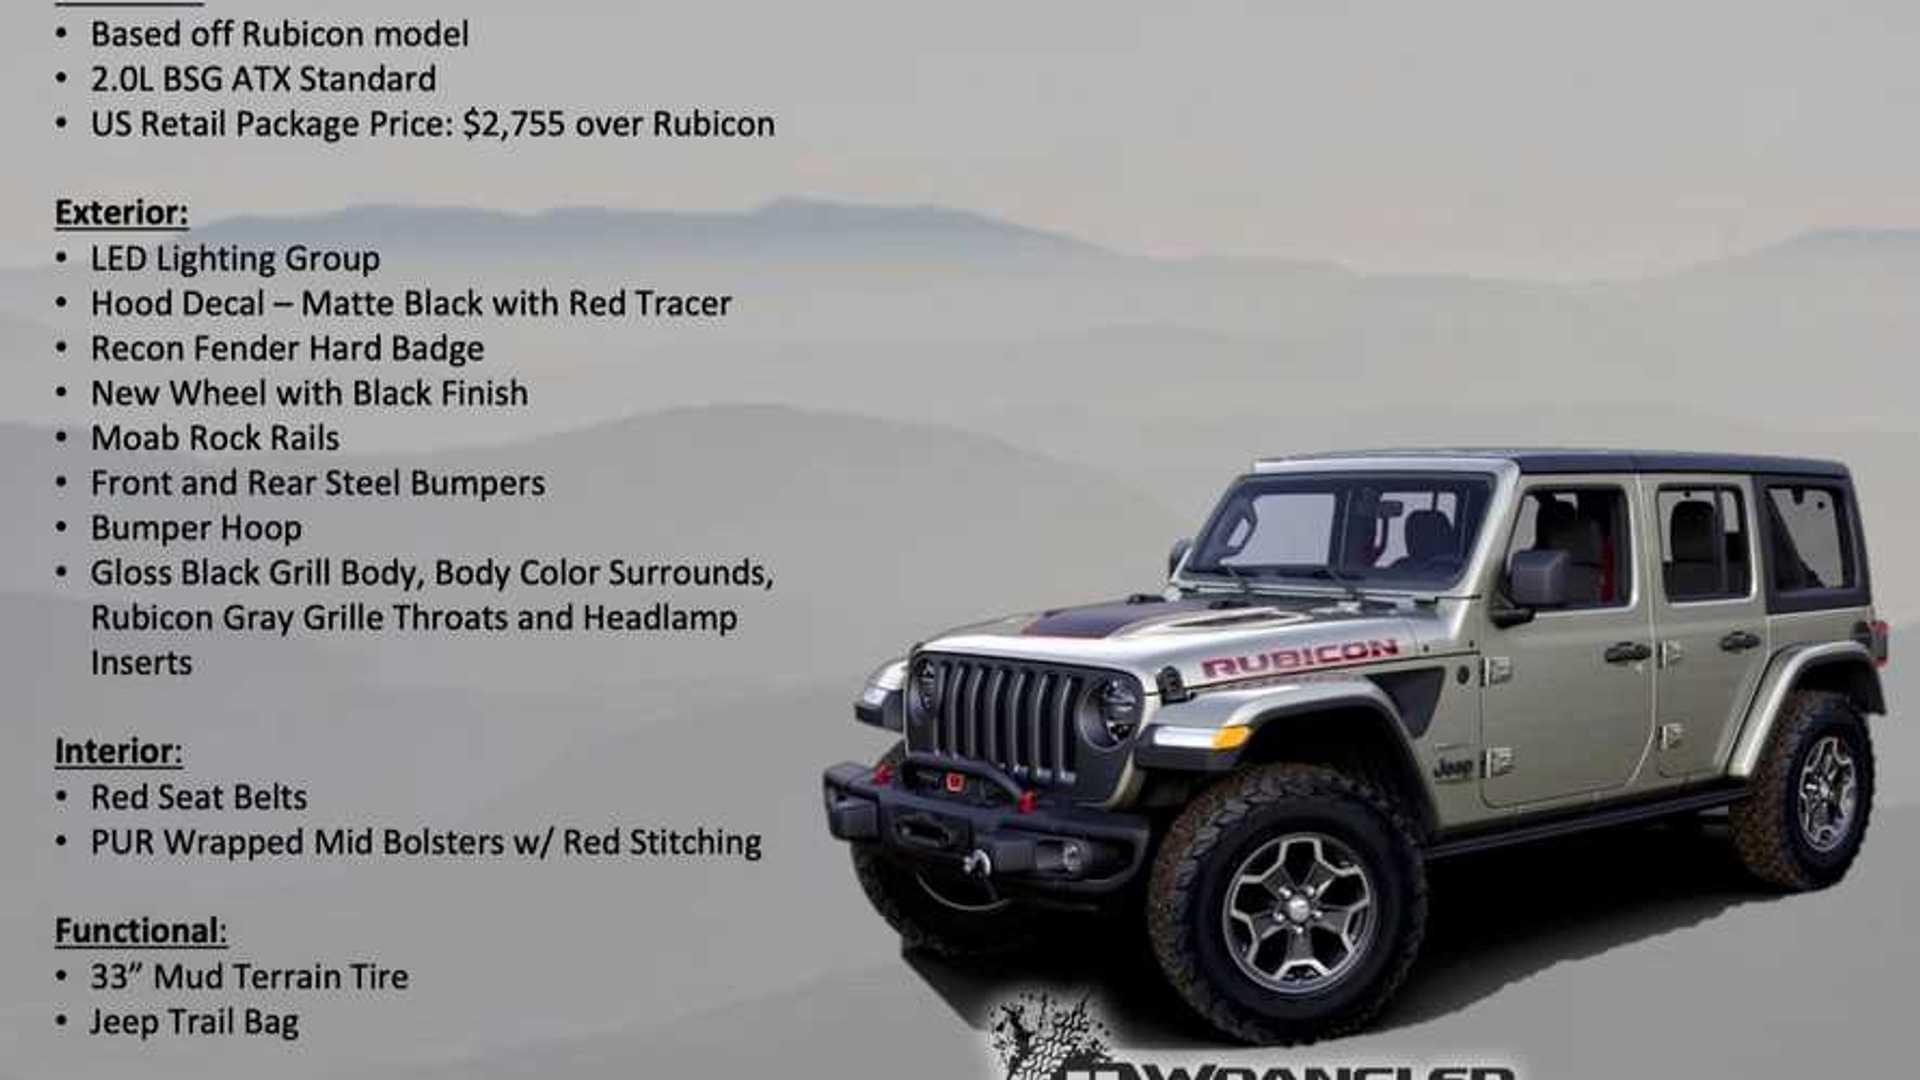 2020 Jeep Wrangler Rubicon Recon Interior